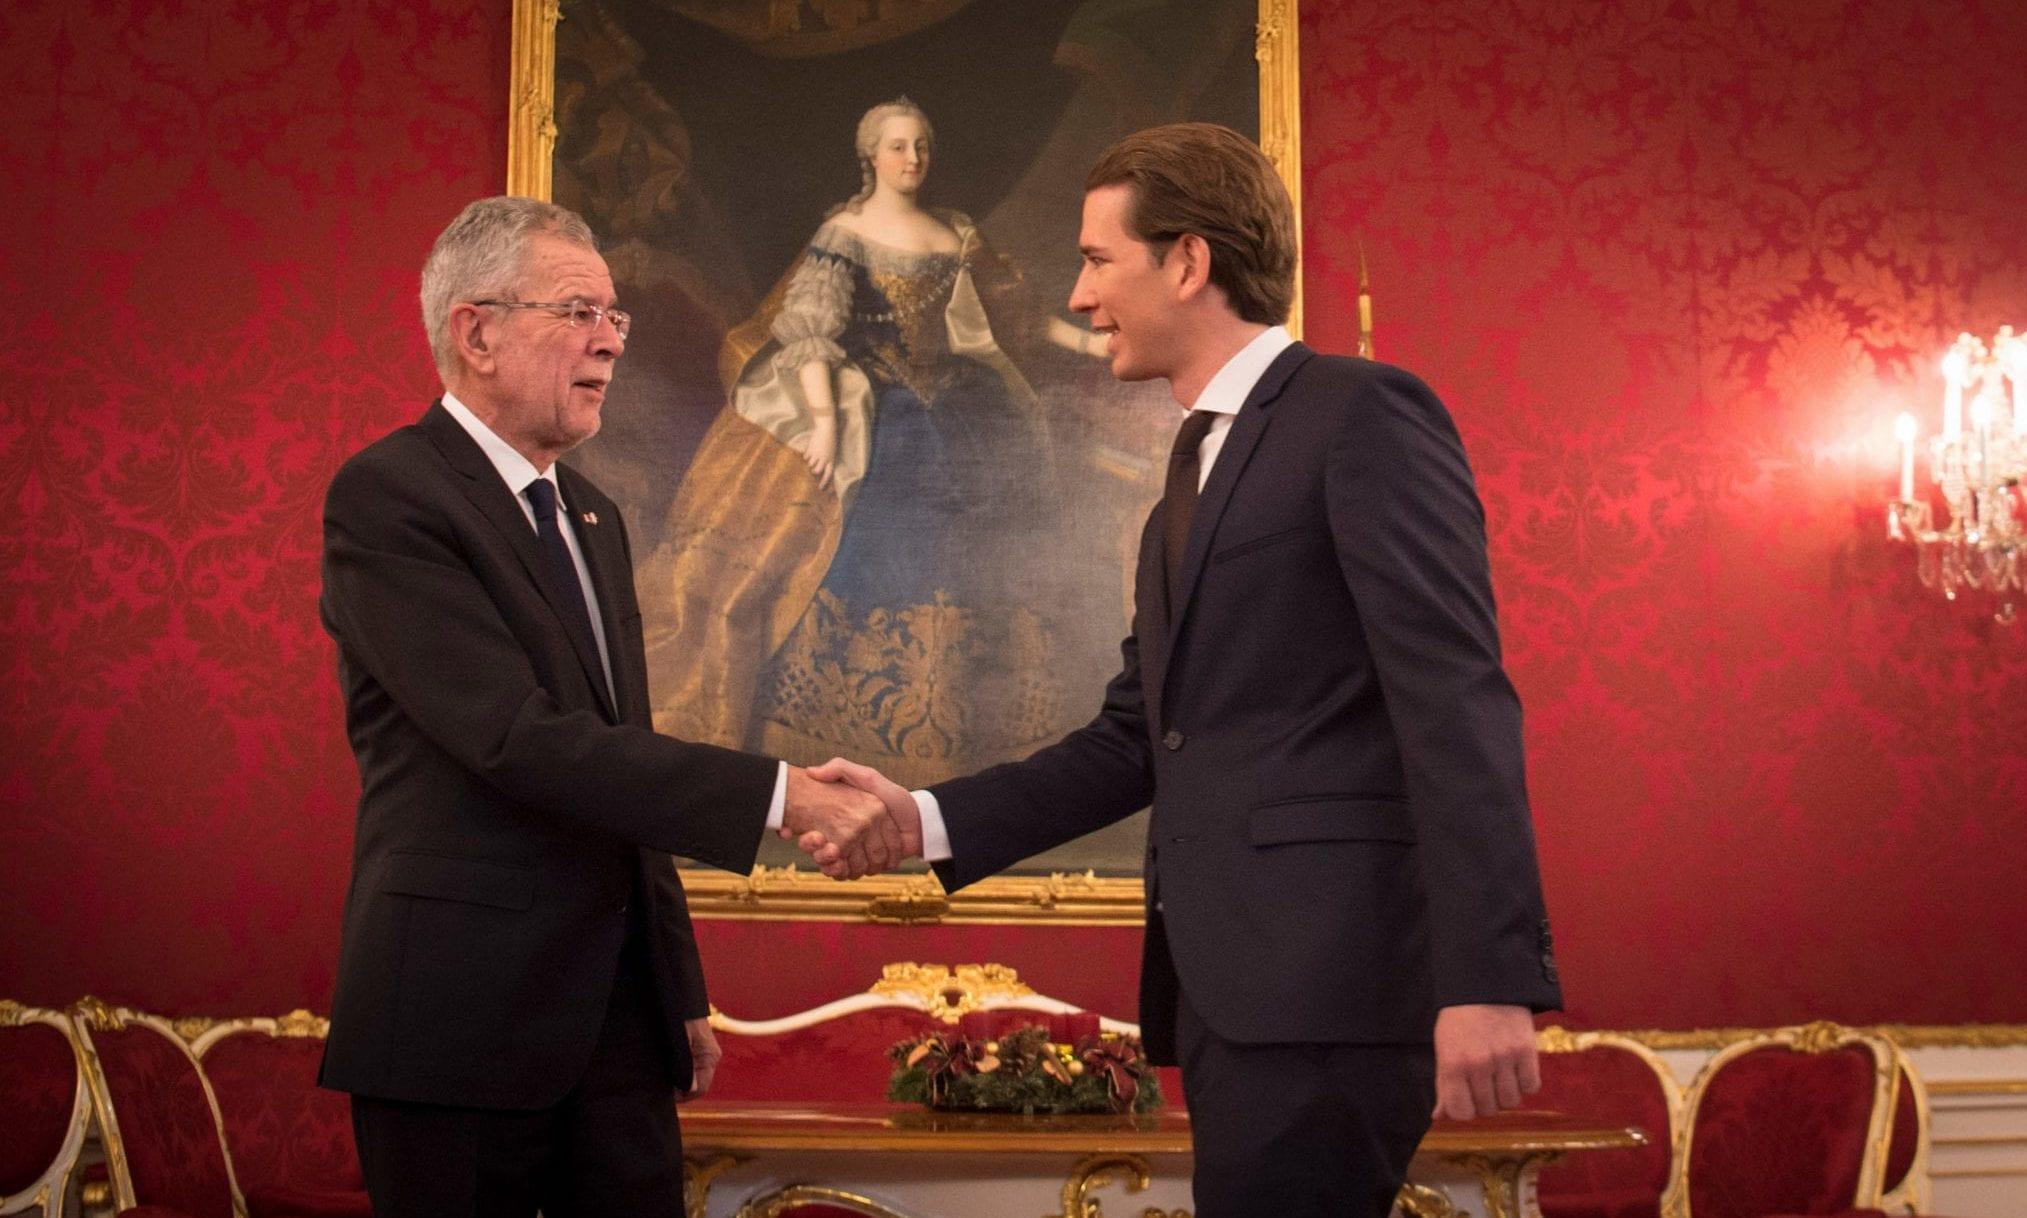 Bundespräsident Alexander Van der Bellen und Bundeskanzler Sebastian Kurz